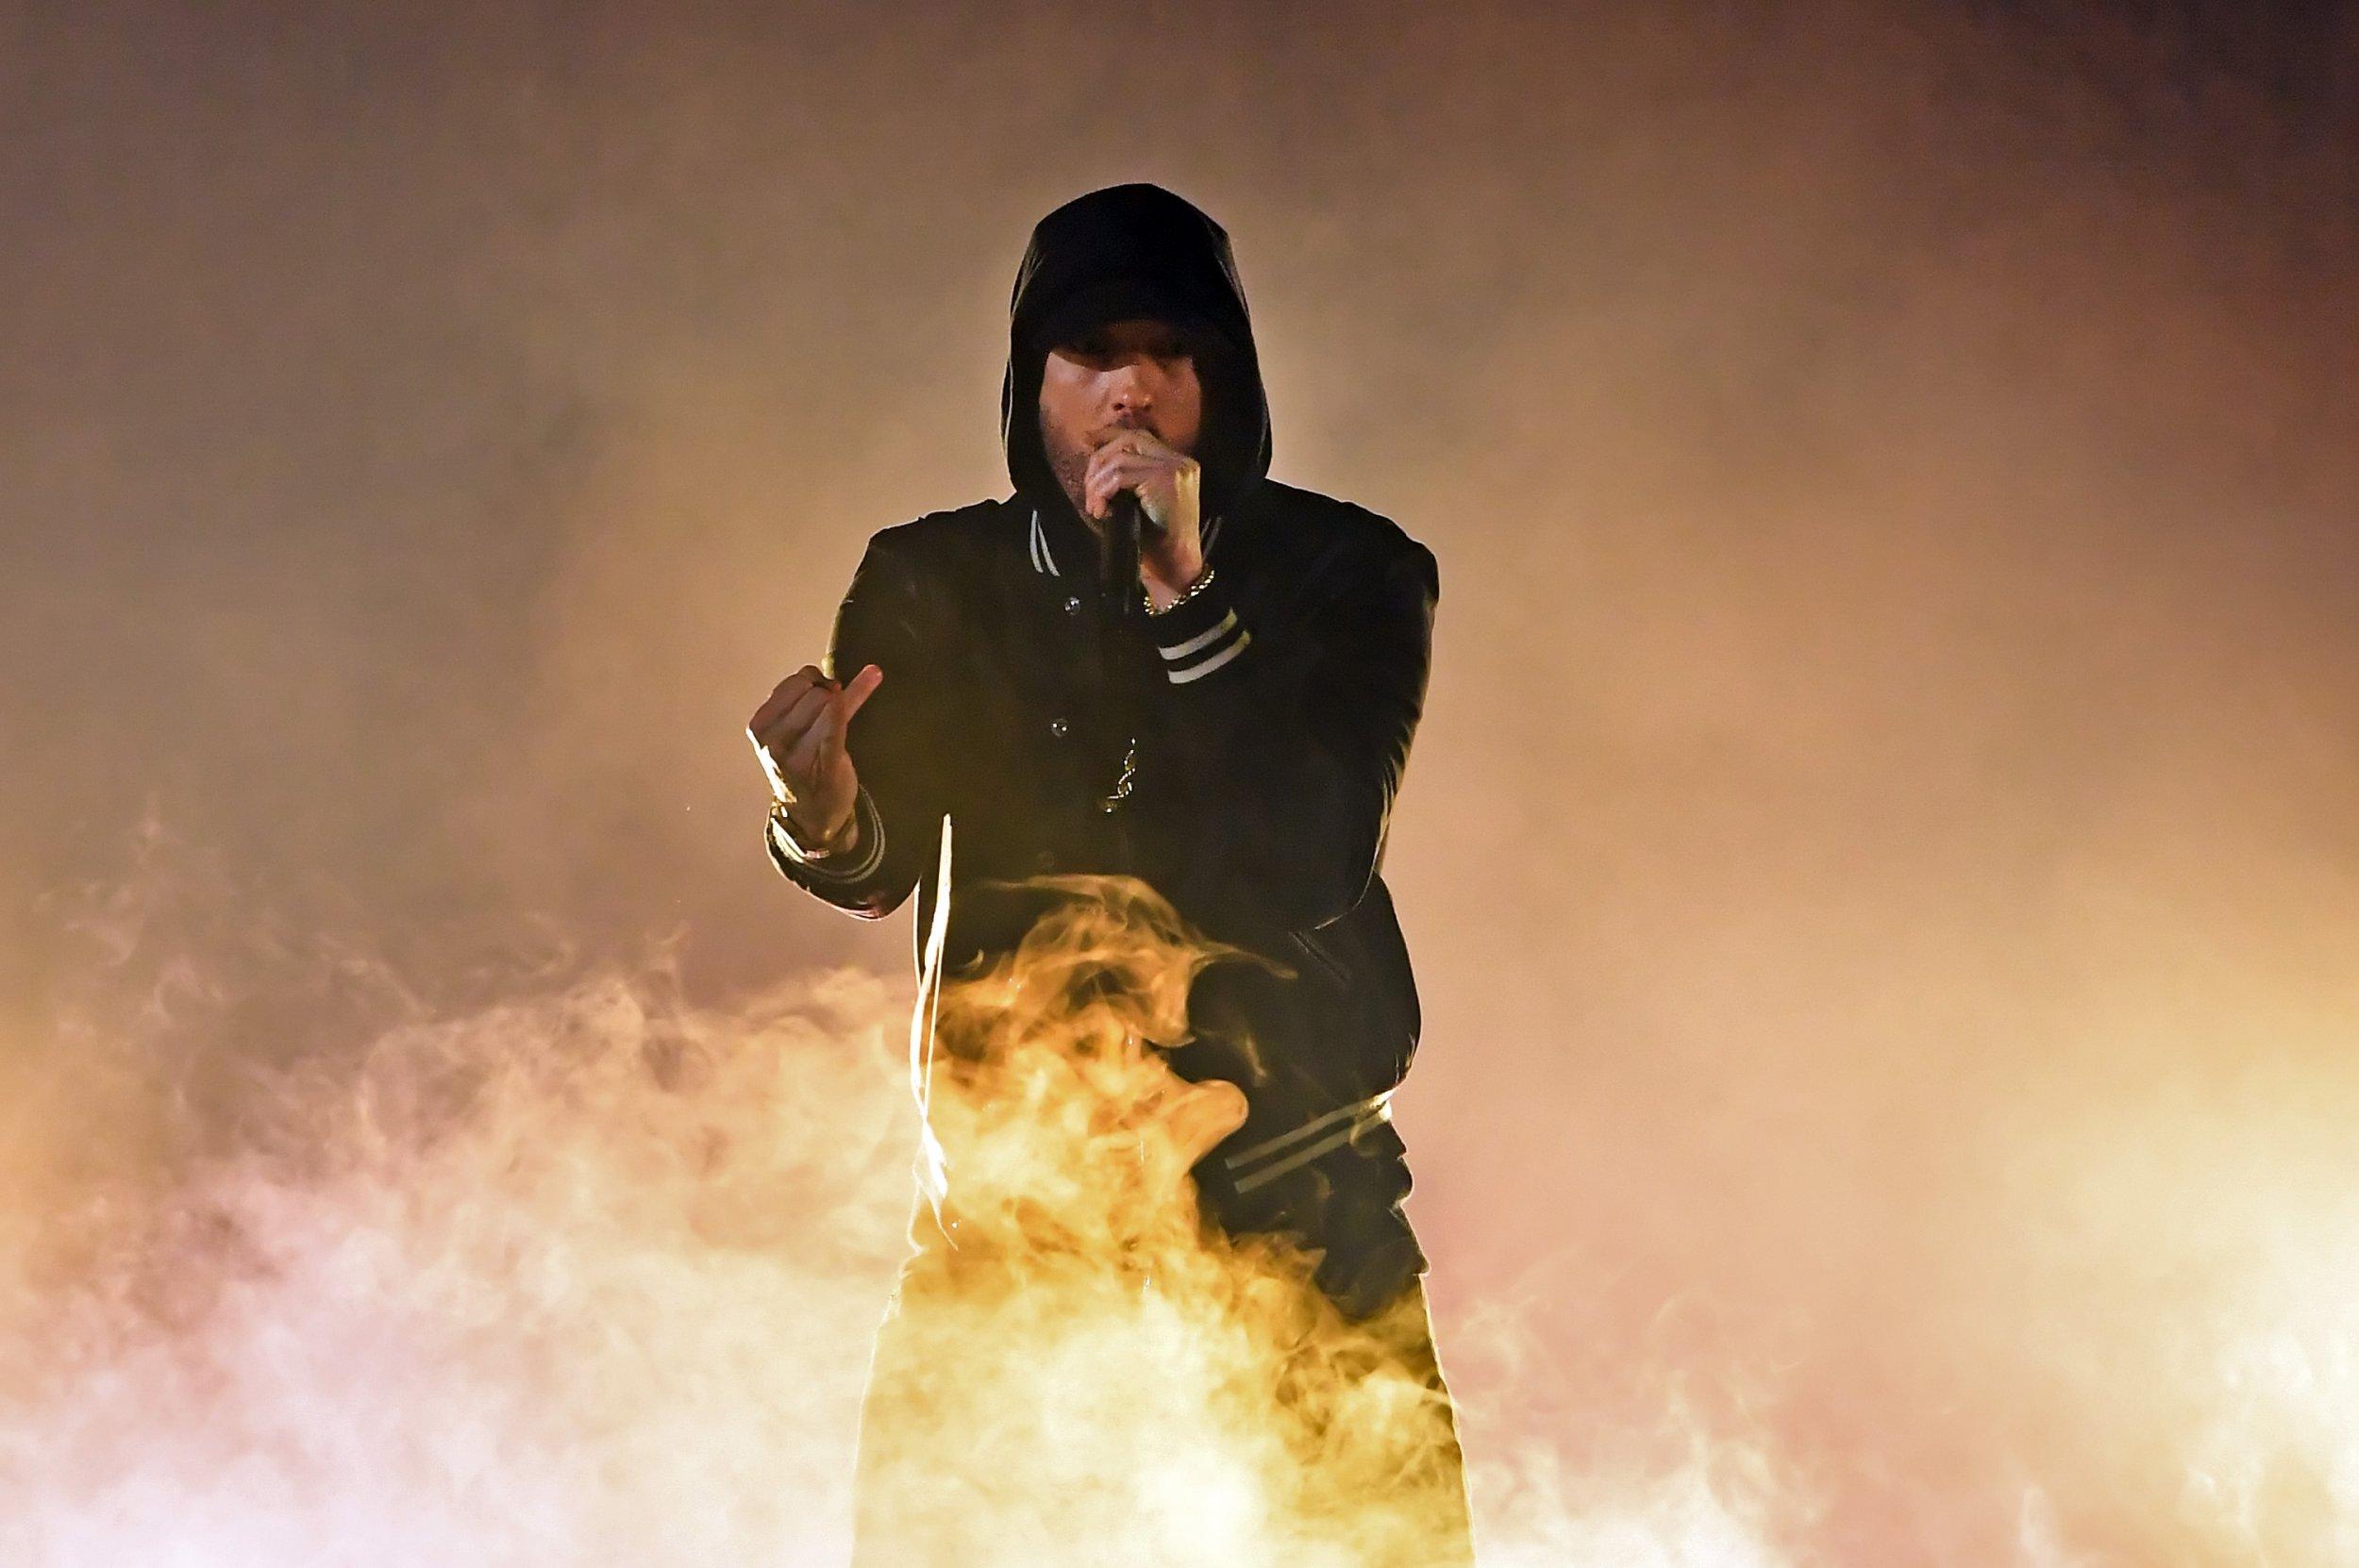 Eminem Mentions Rapper Hopsin on 'Kamikaze' Album